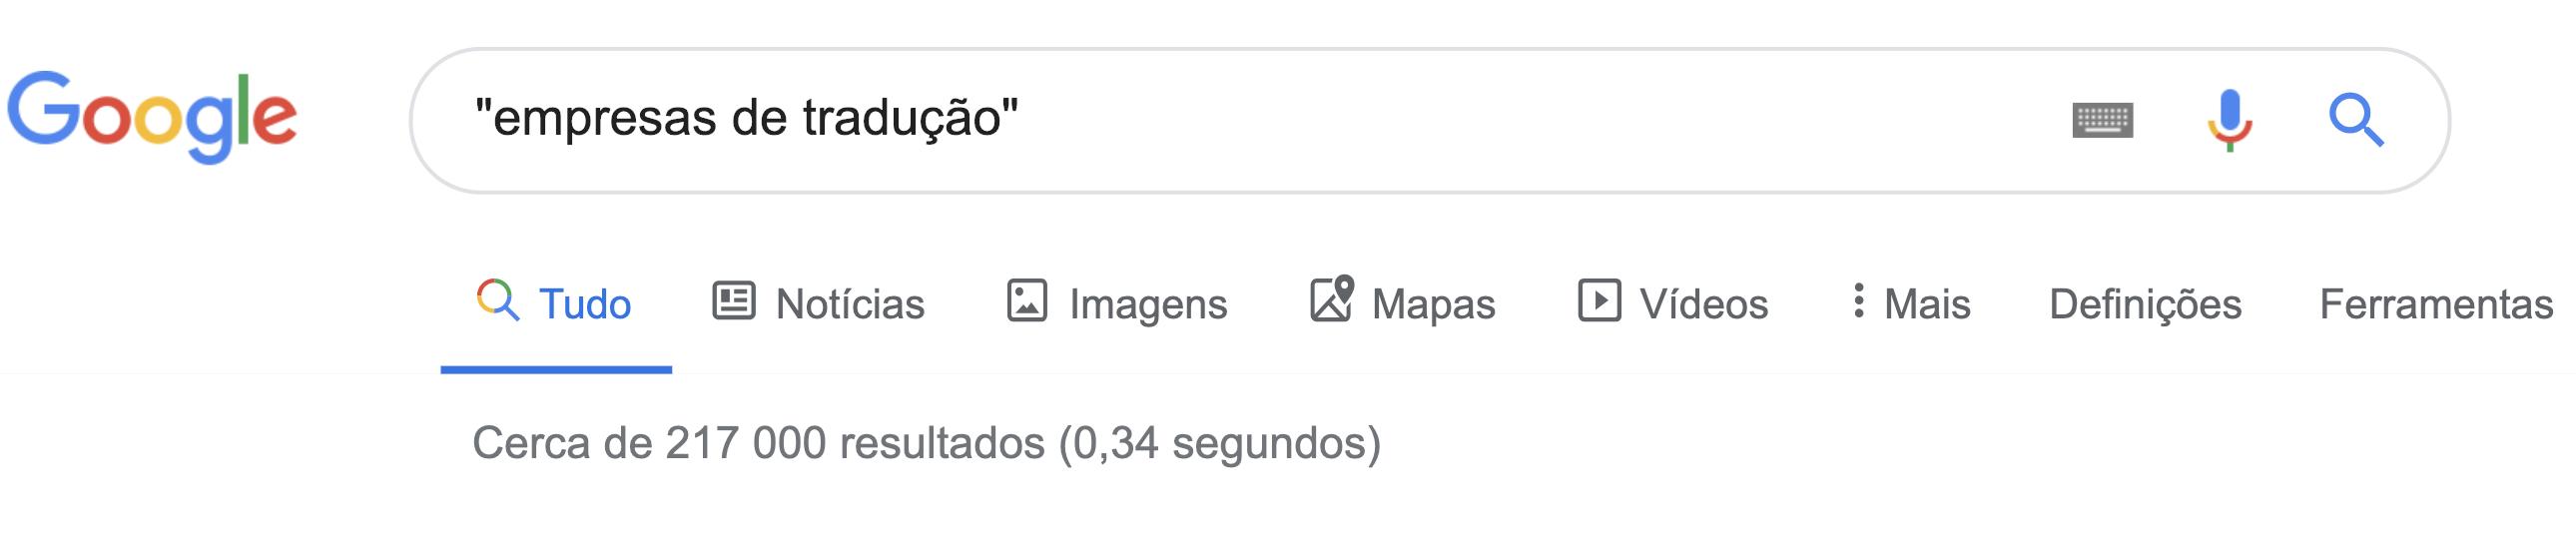 pesquisa-google-utilizar-aspas